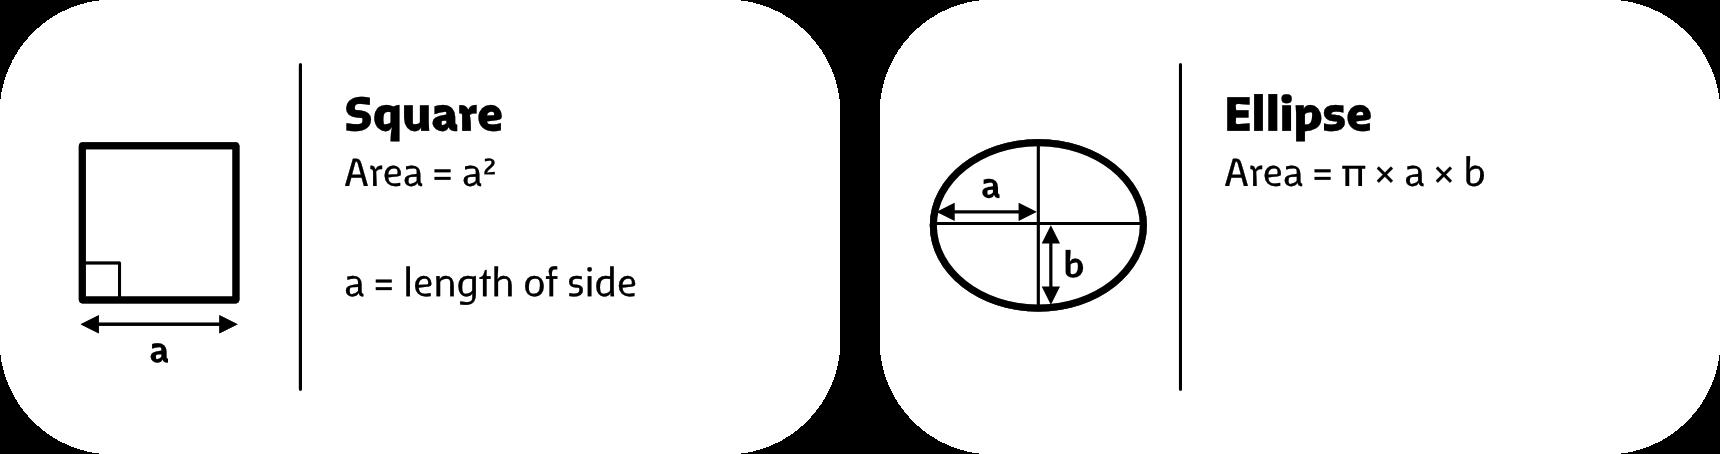 Image-Measure-4